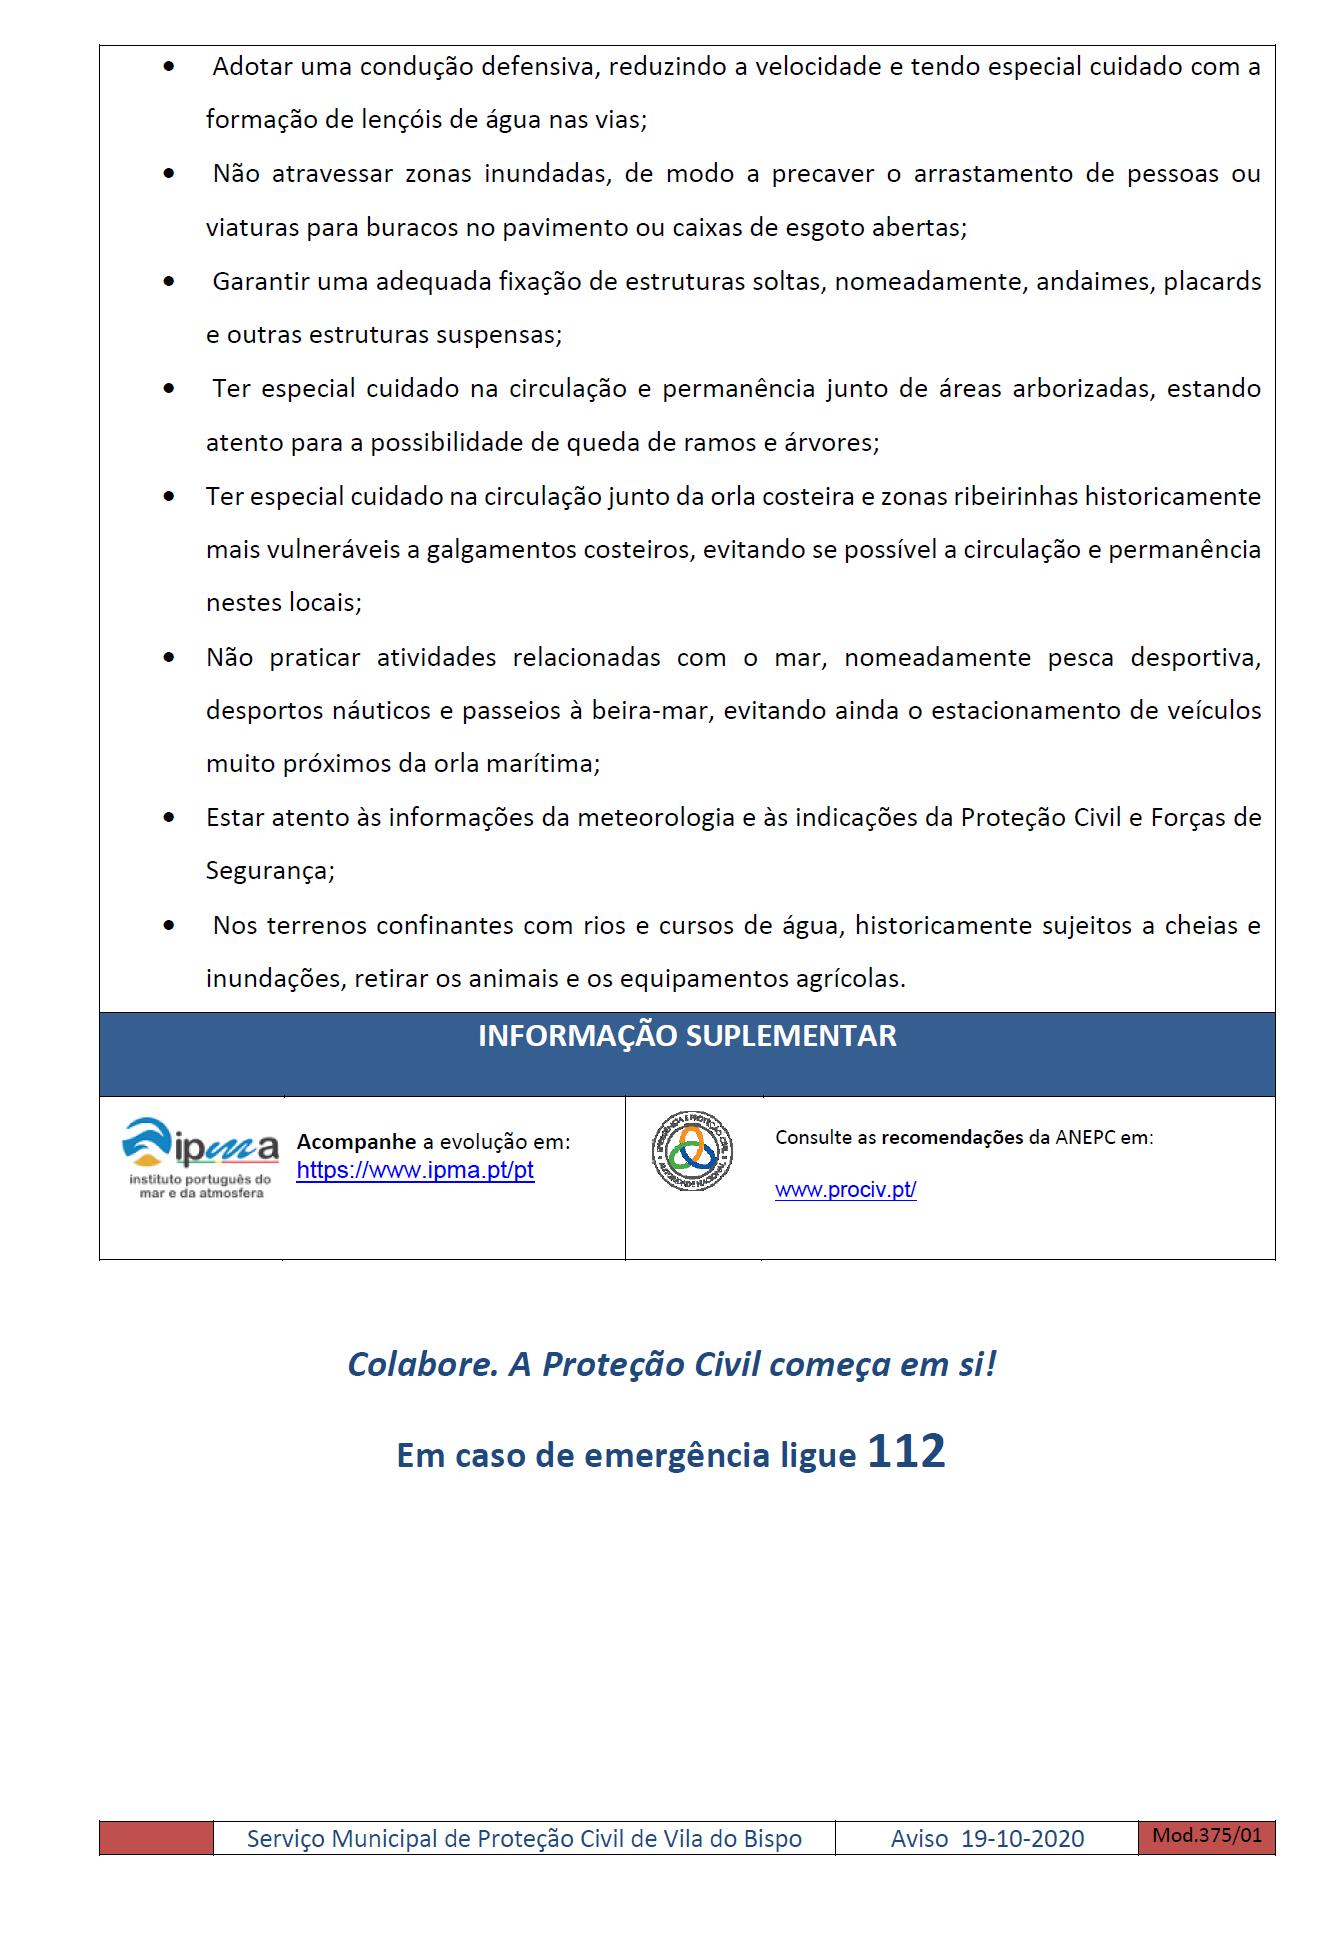 Multimédia1